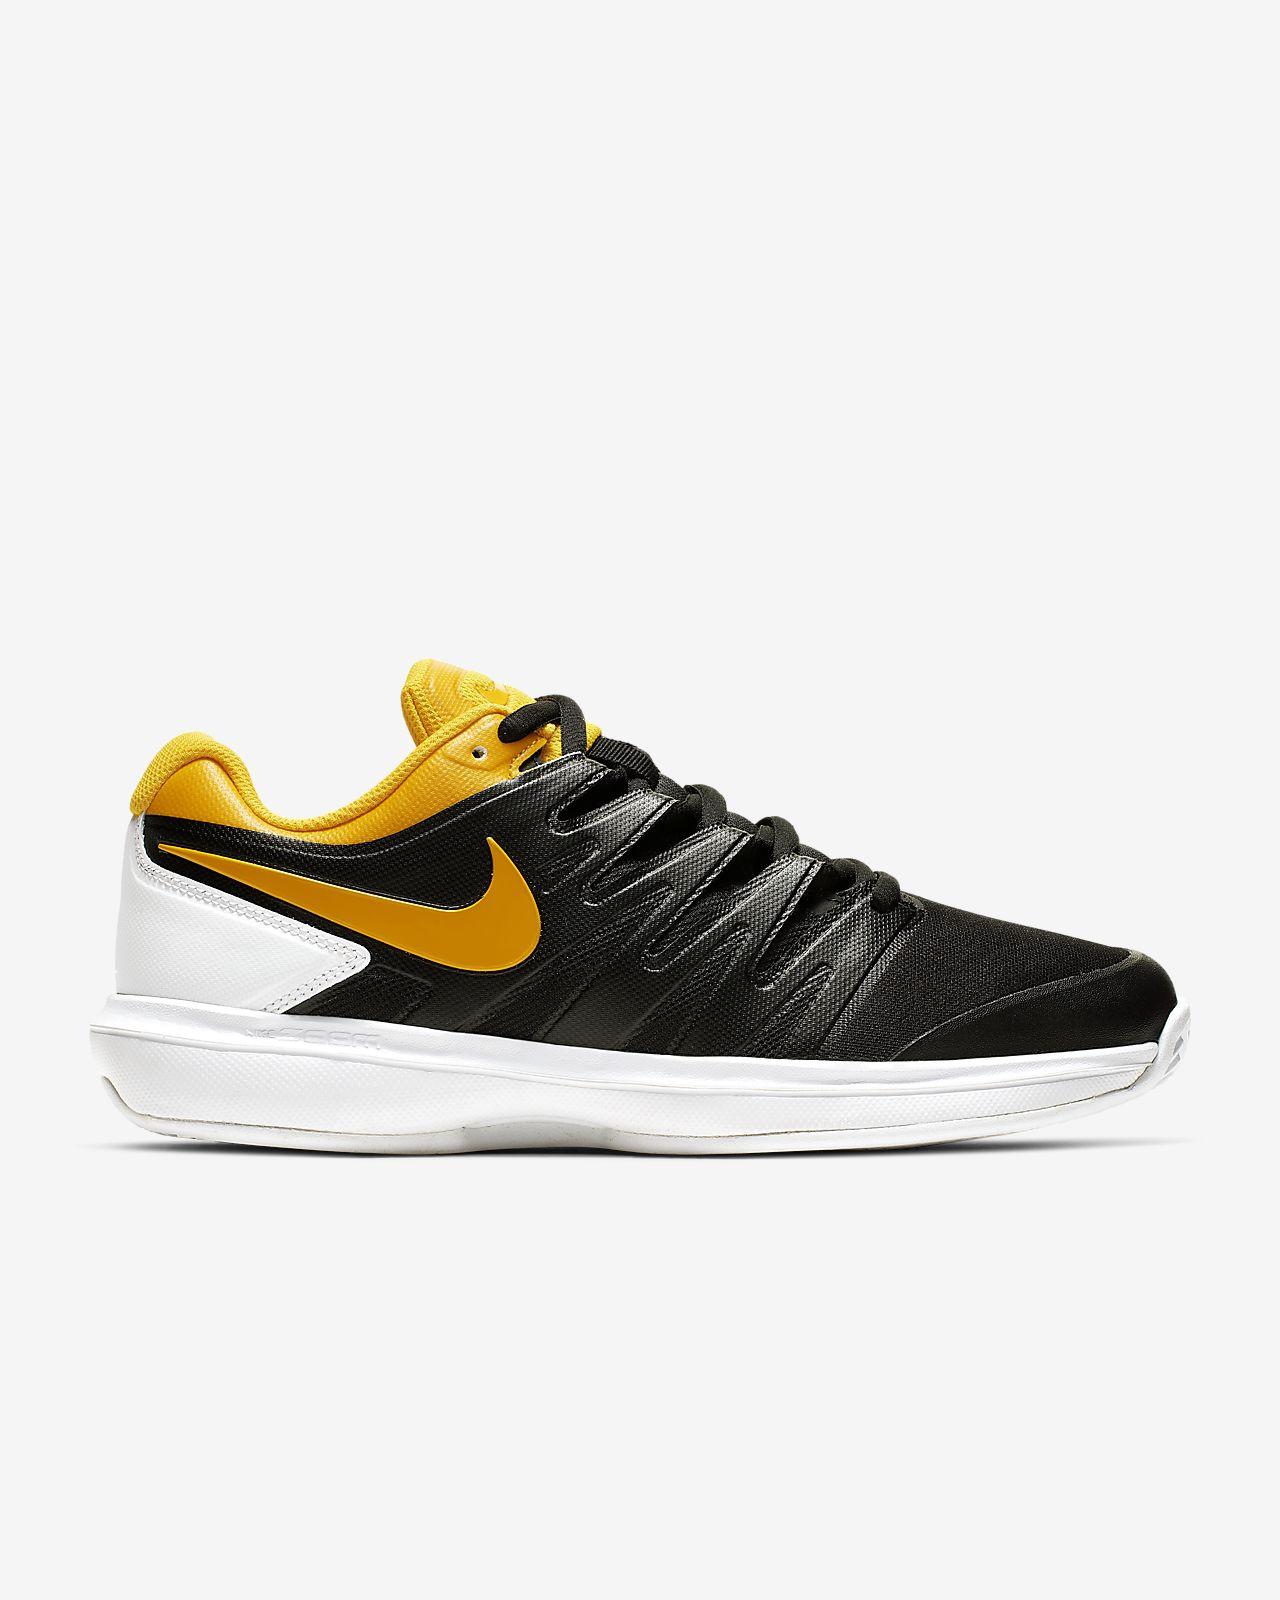 reputable site 40f6c 27ba9 ... Tennissko Nike Air Zoom Prestige Clay för män